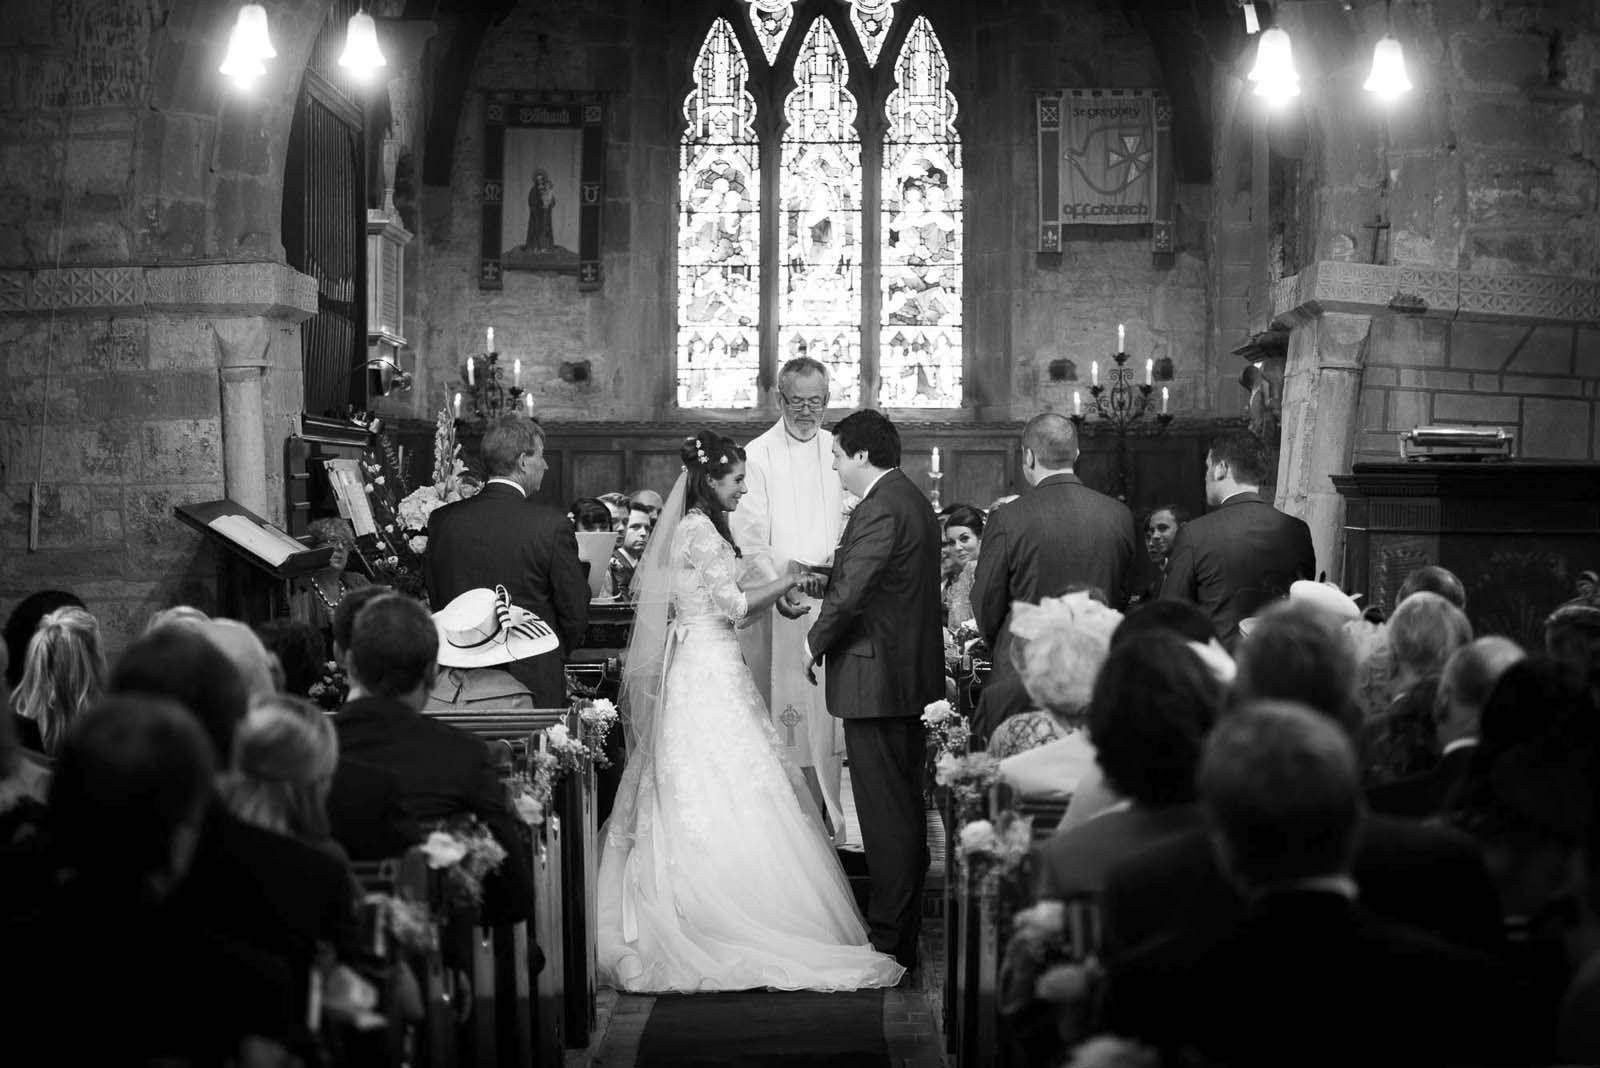 Lizzie Charles by London Wedding Photographer Matthew Williams-Ellis